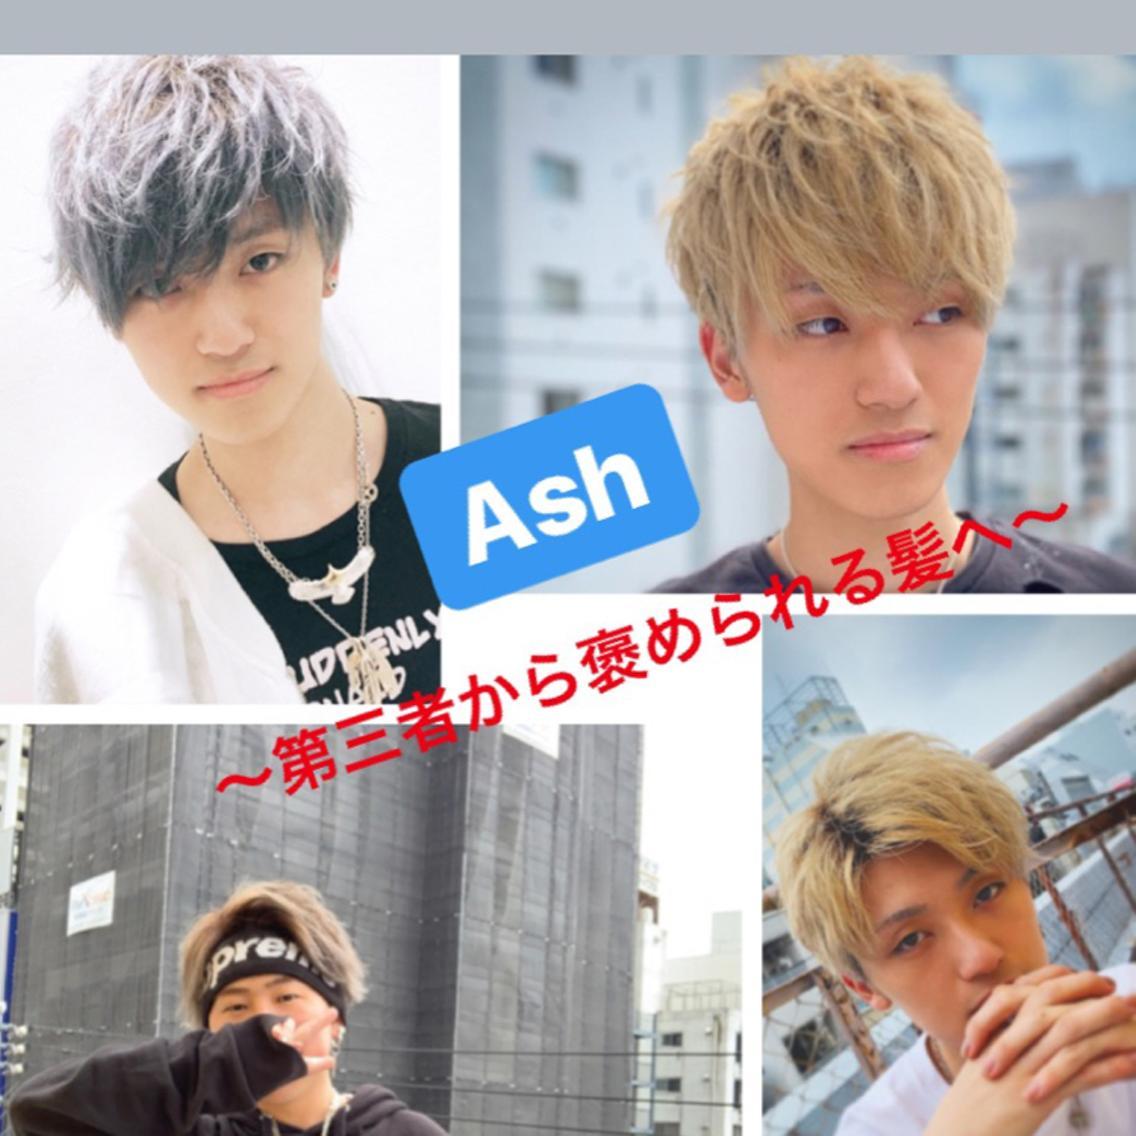 Ash 町田店所属・メンズデザイナー・露木智也の掲載